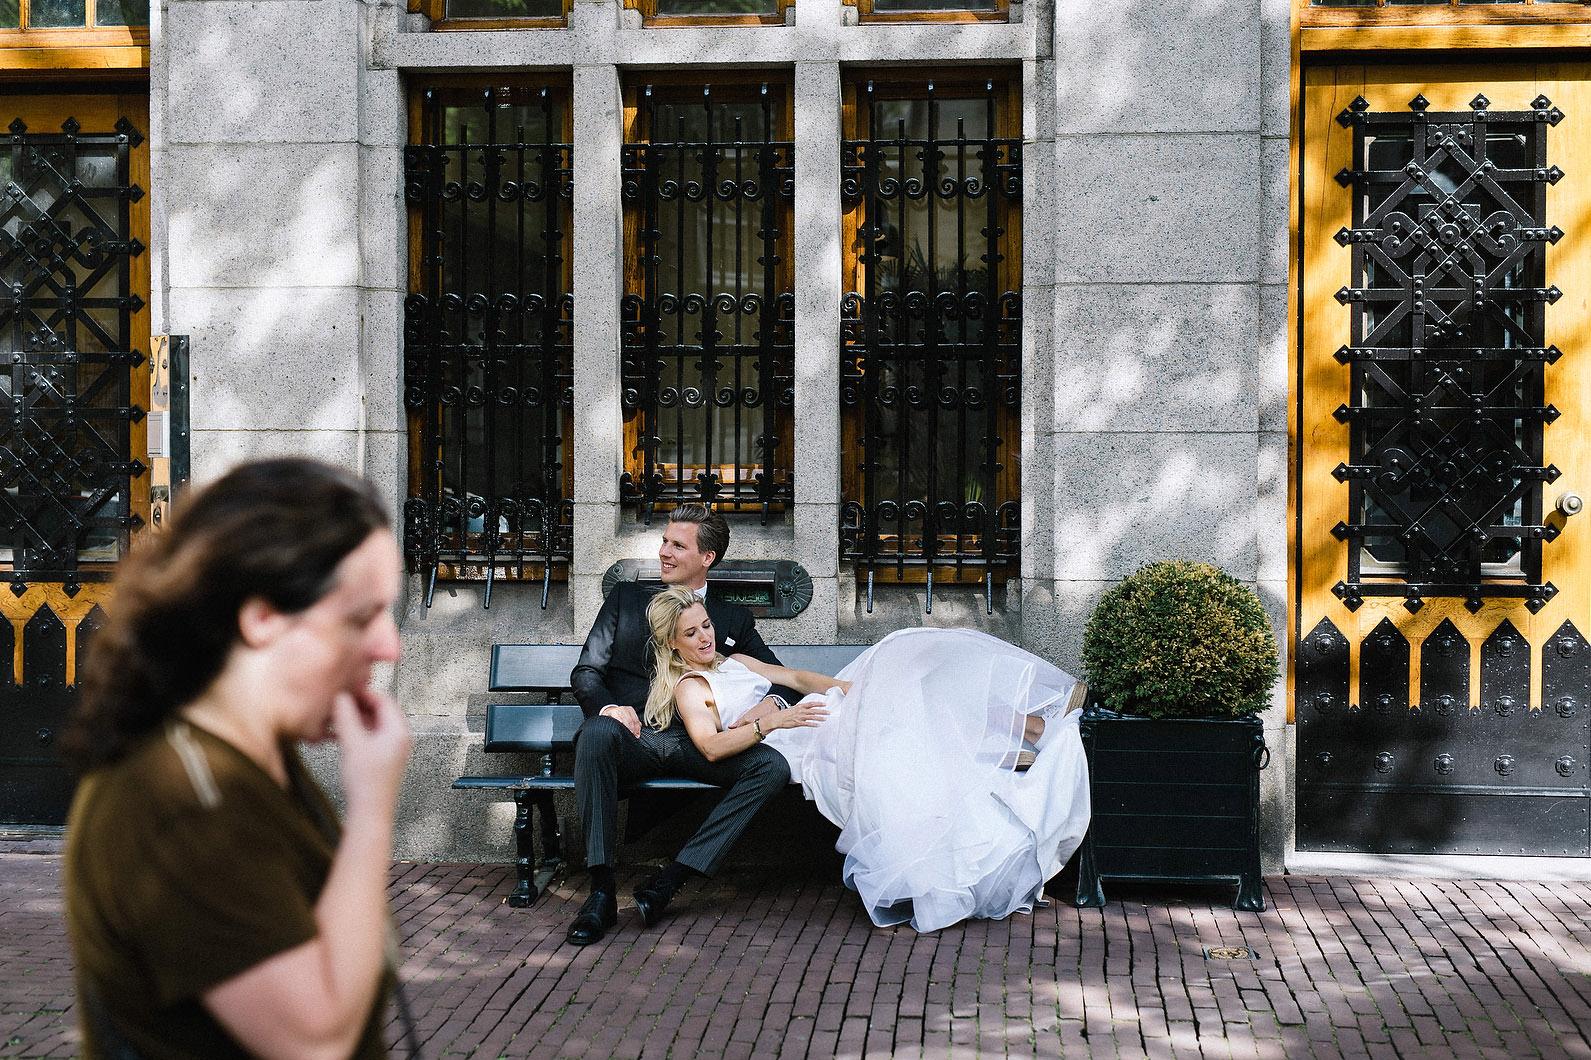 Fotograf Konstanz - Destination Wedding Photographer Amsterdam 083 - Destination Wedding Amsterdam  - 189 -